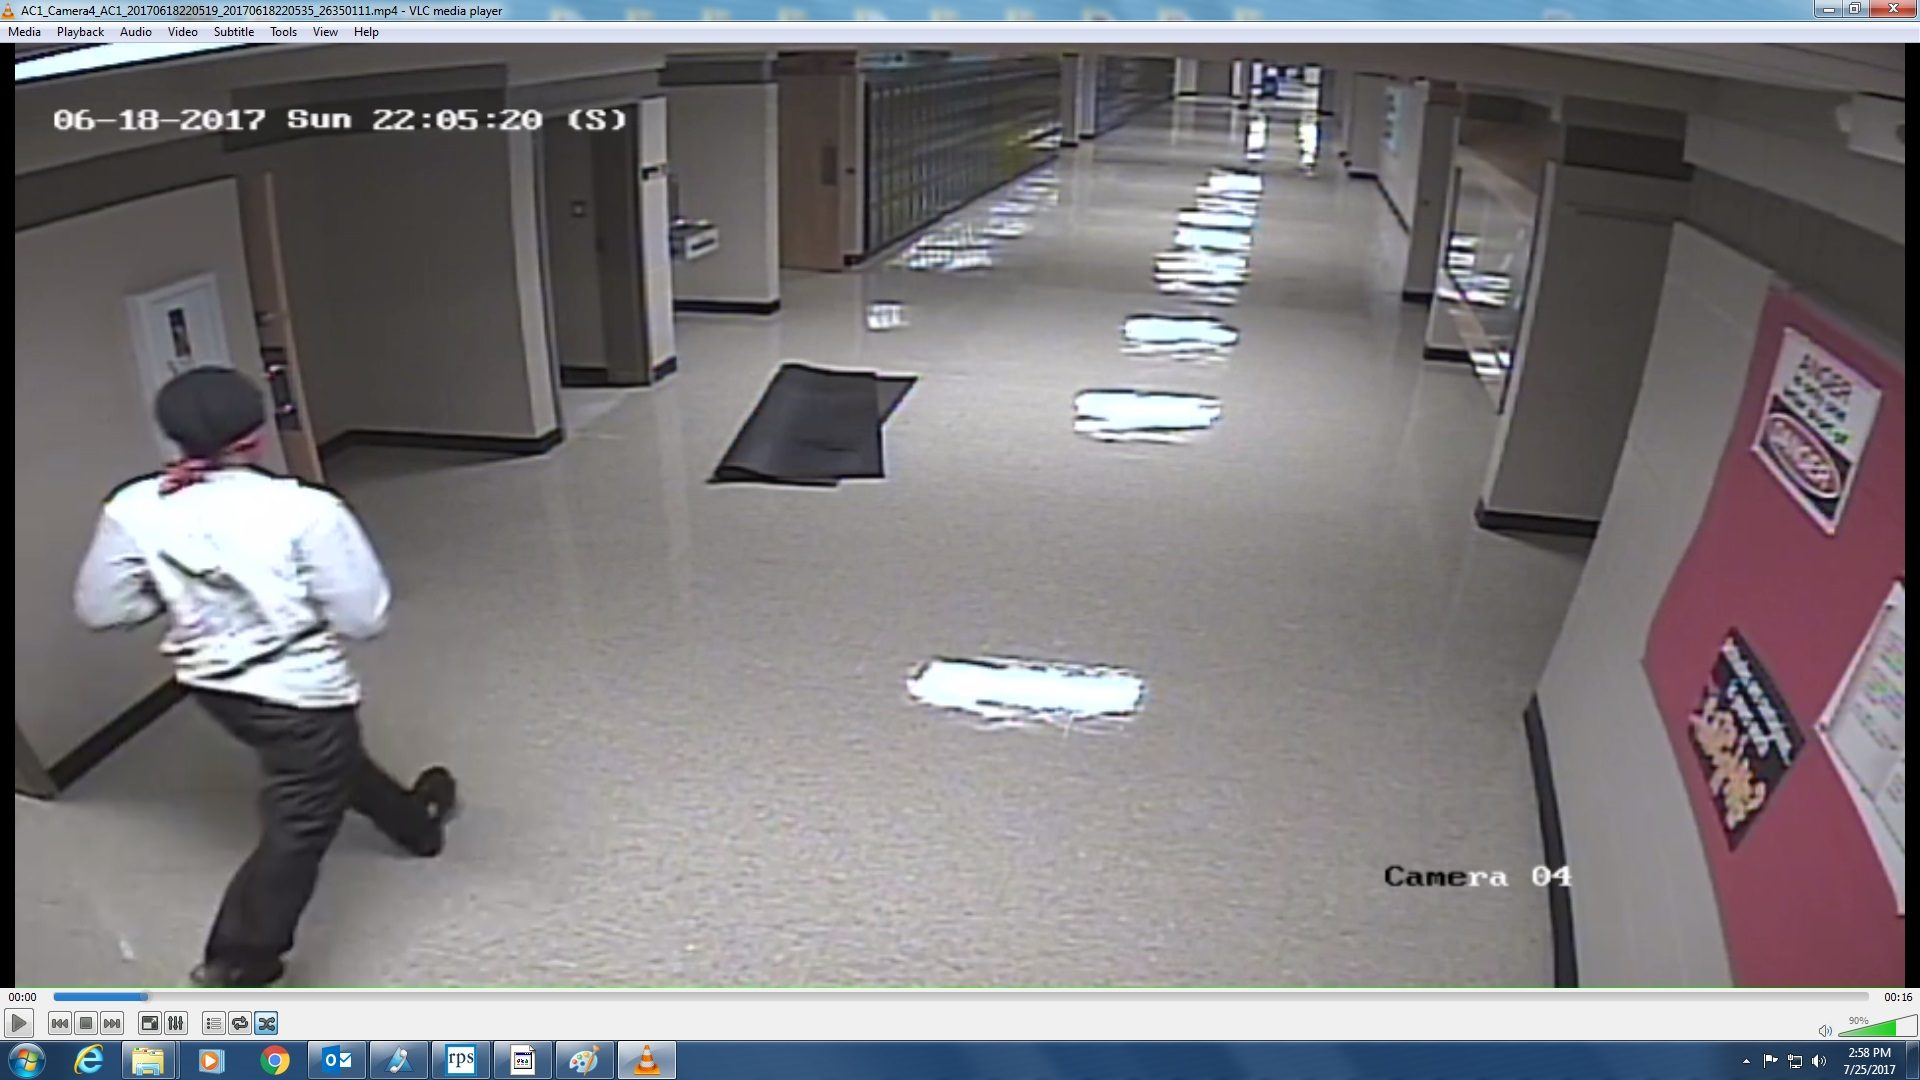 Suspect pic 4